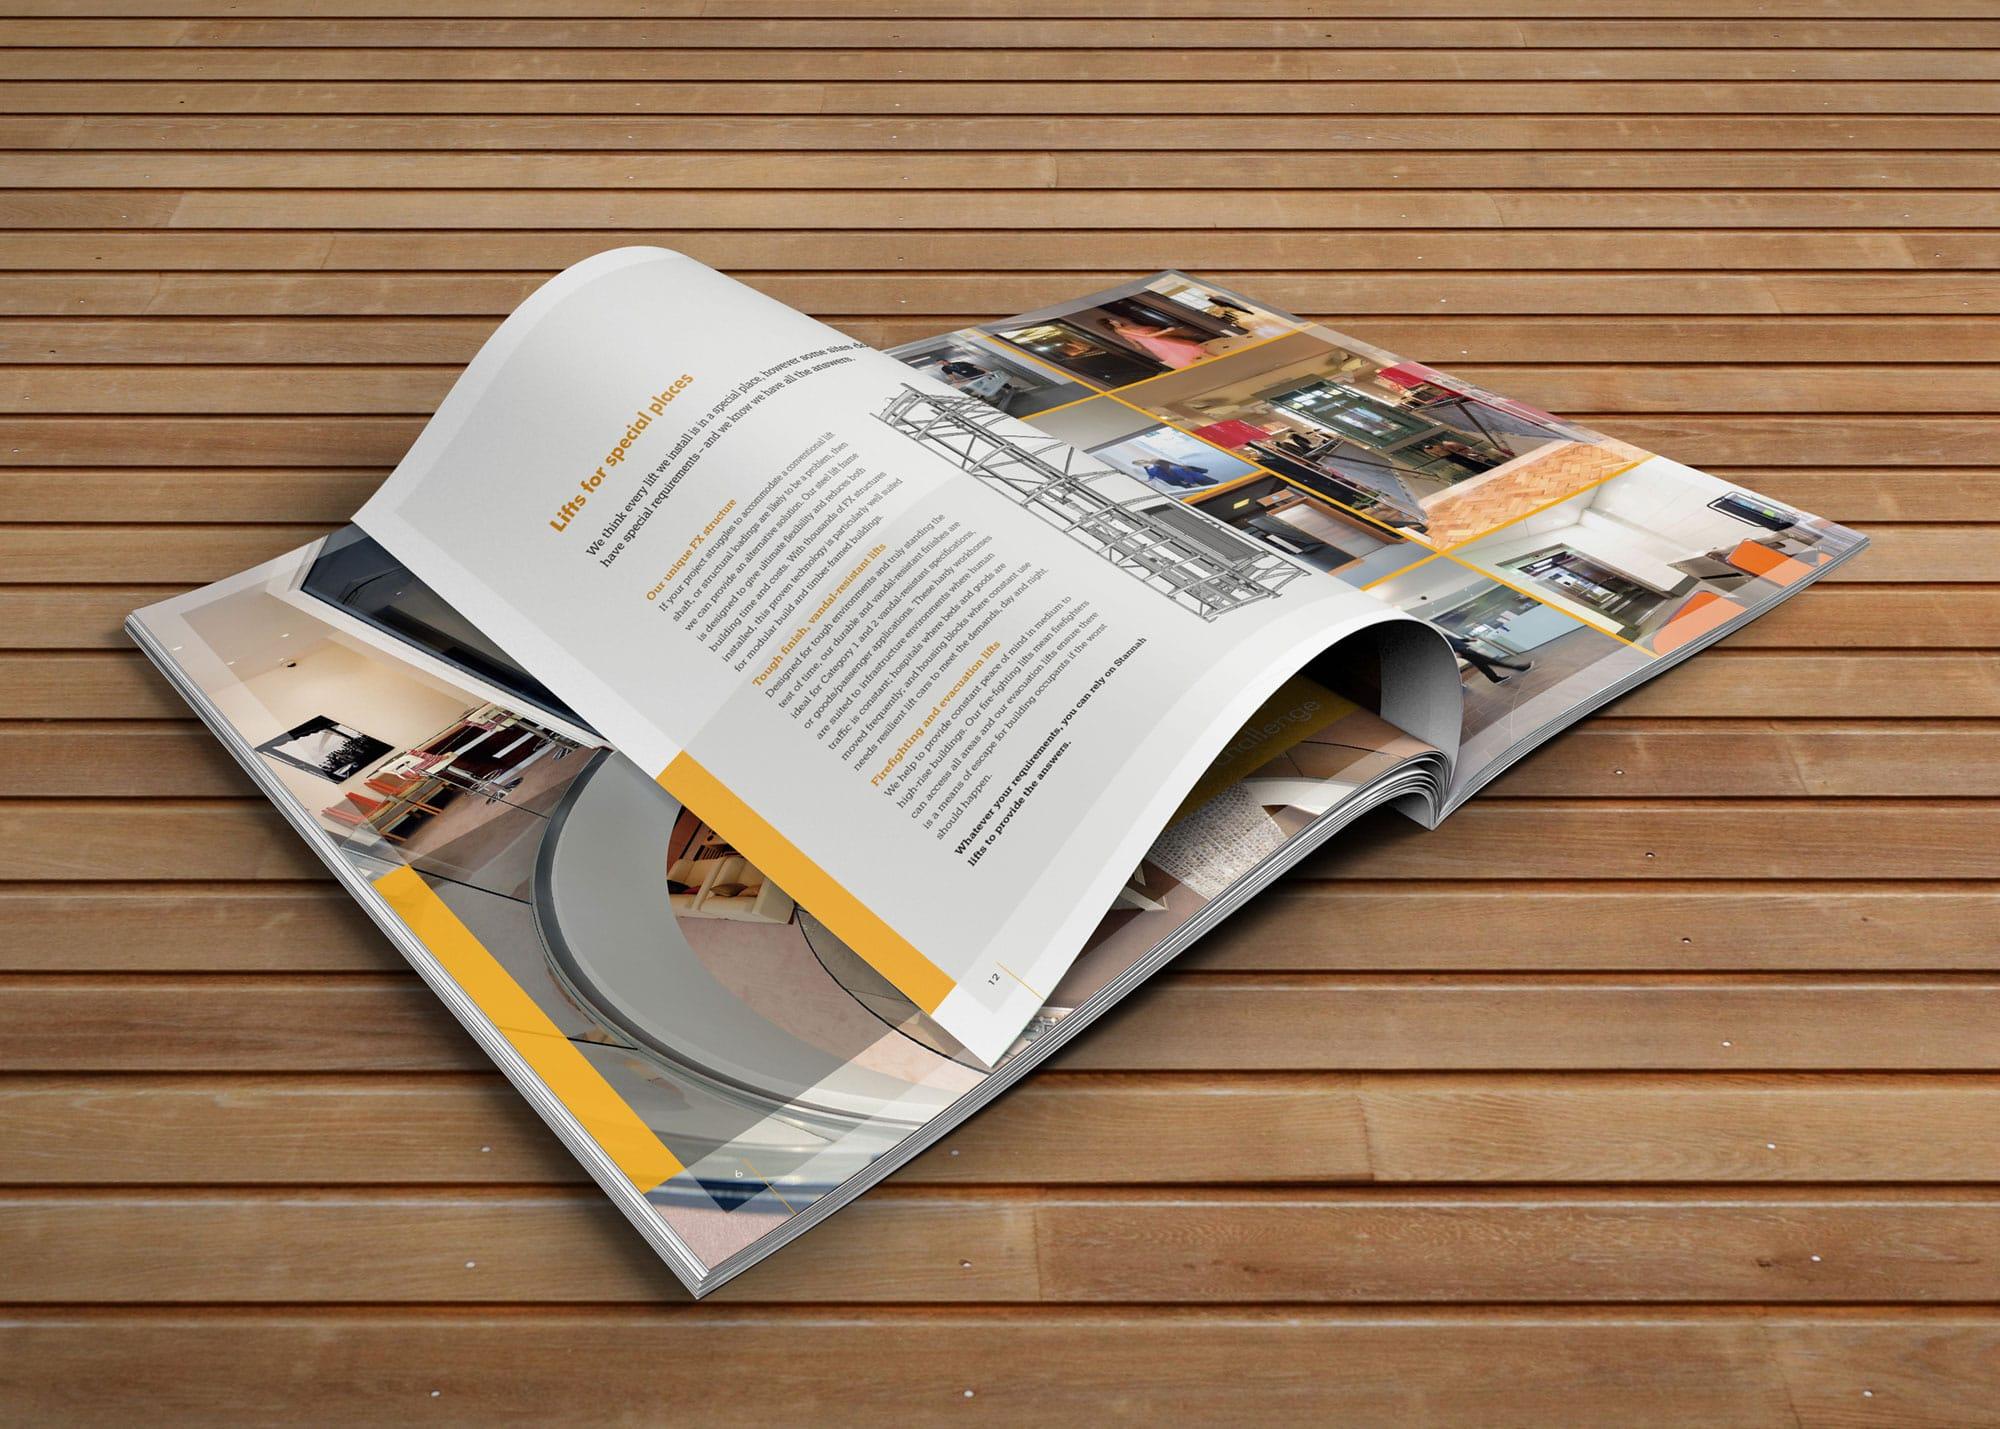 stannah-product-brochure-mockup